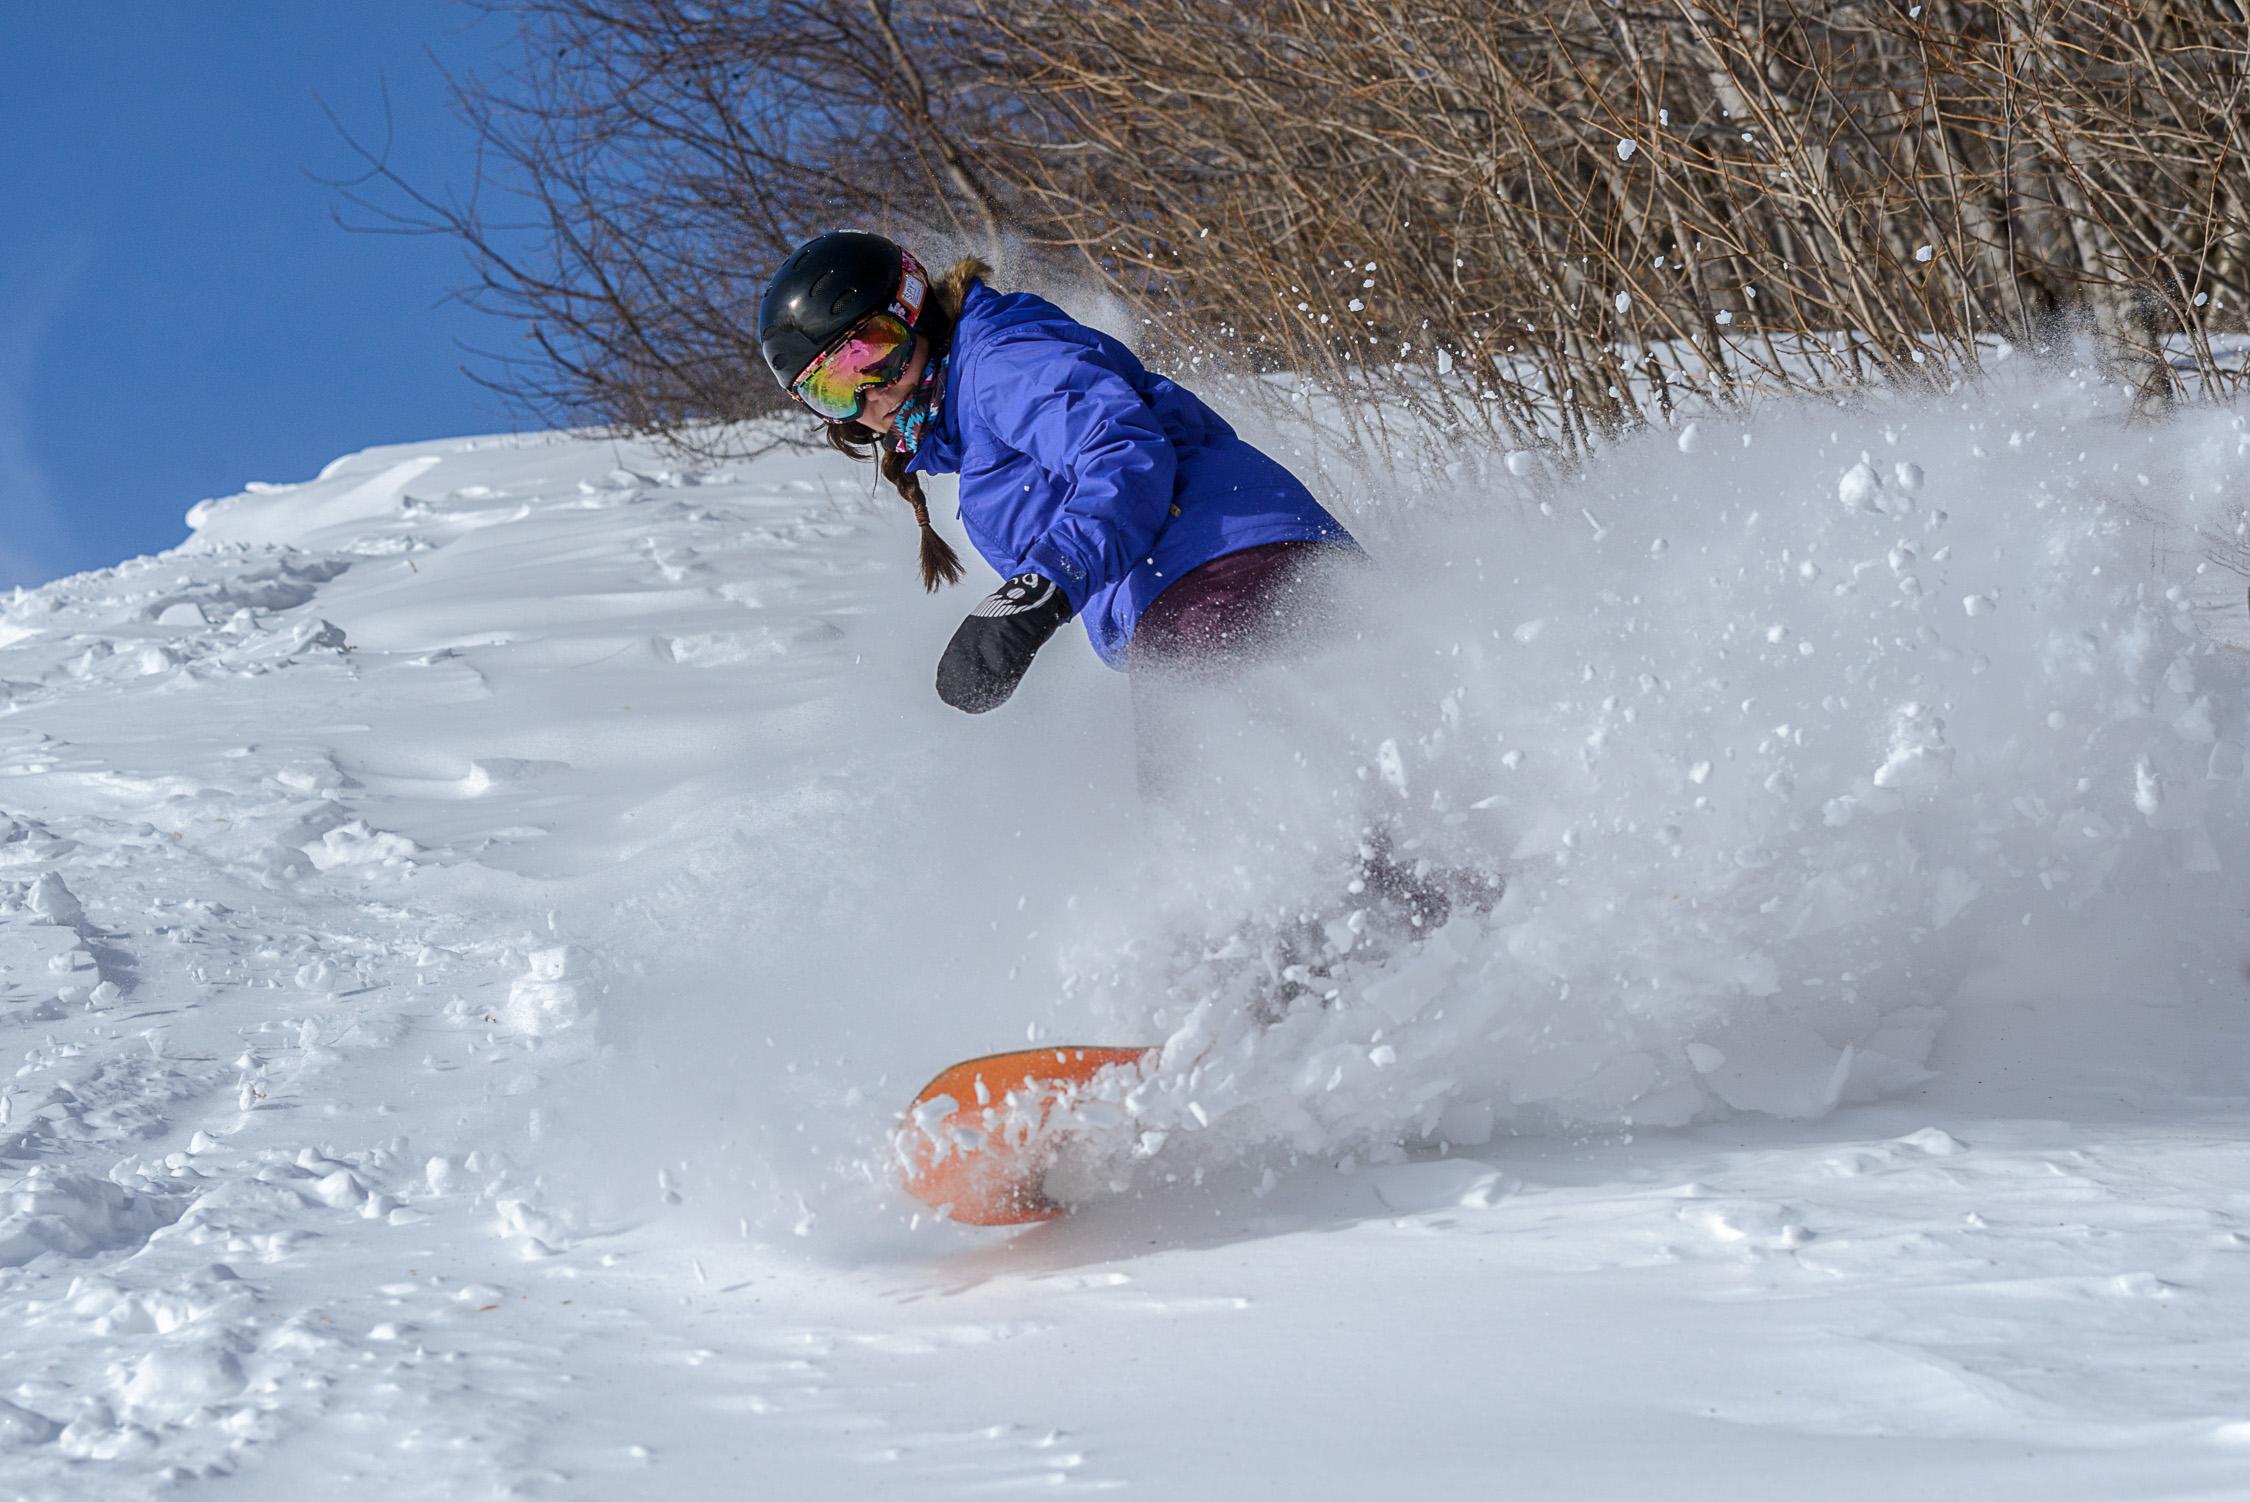 Snowboarding in VT